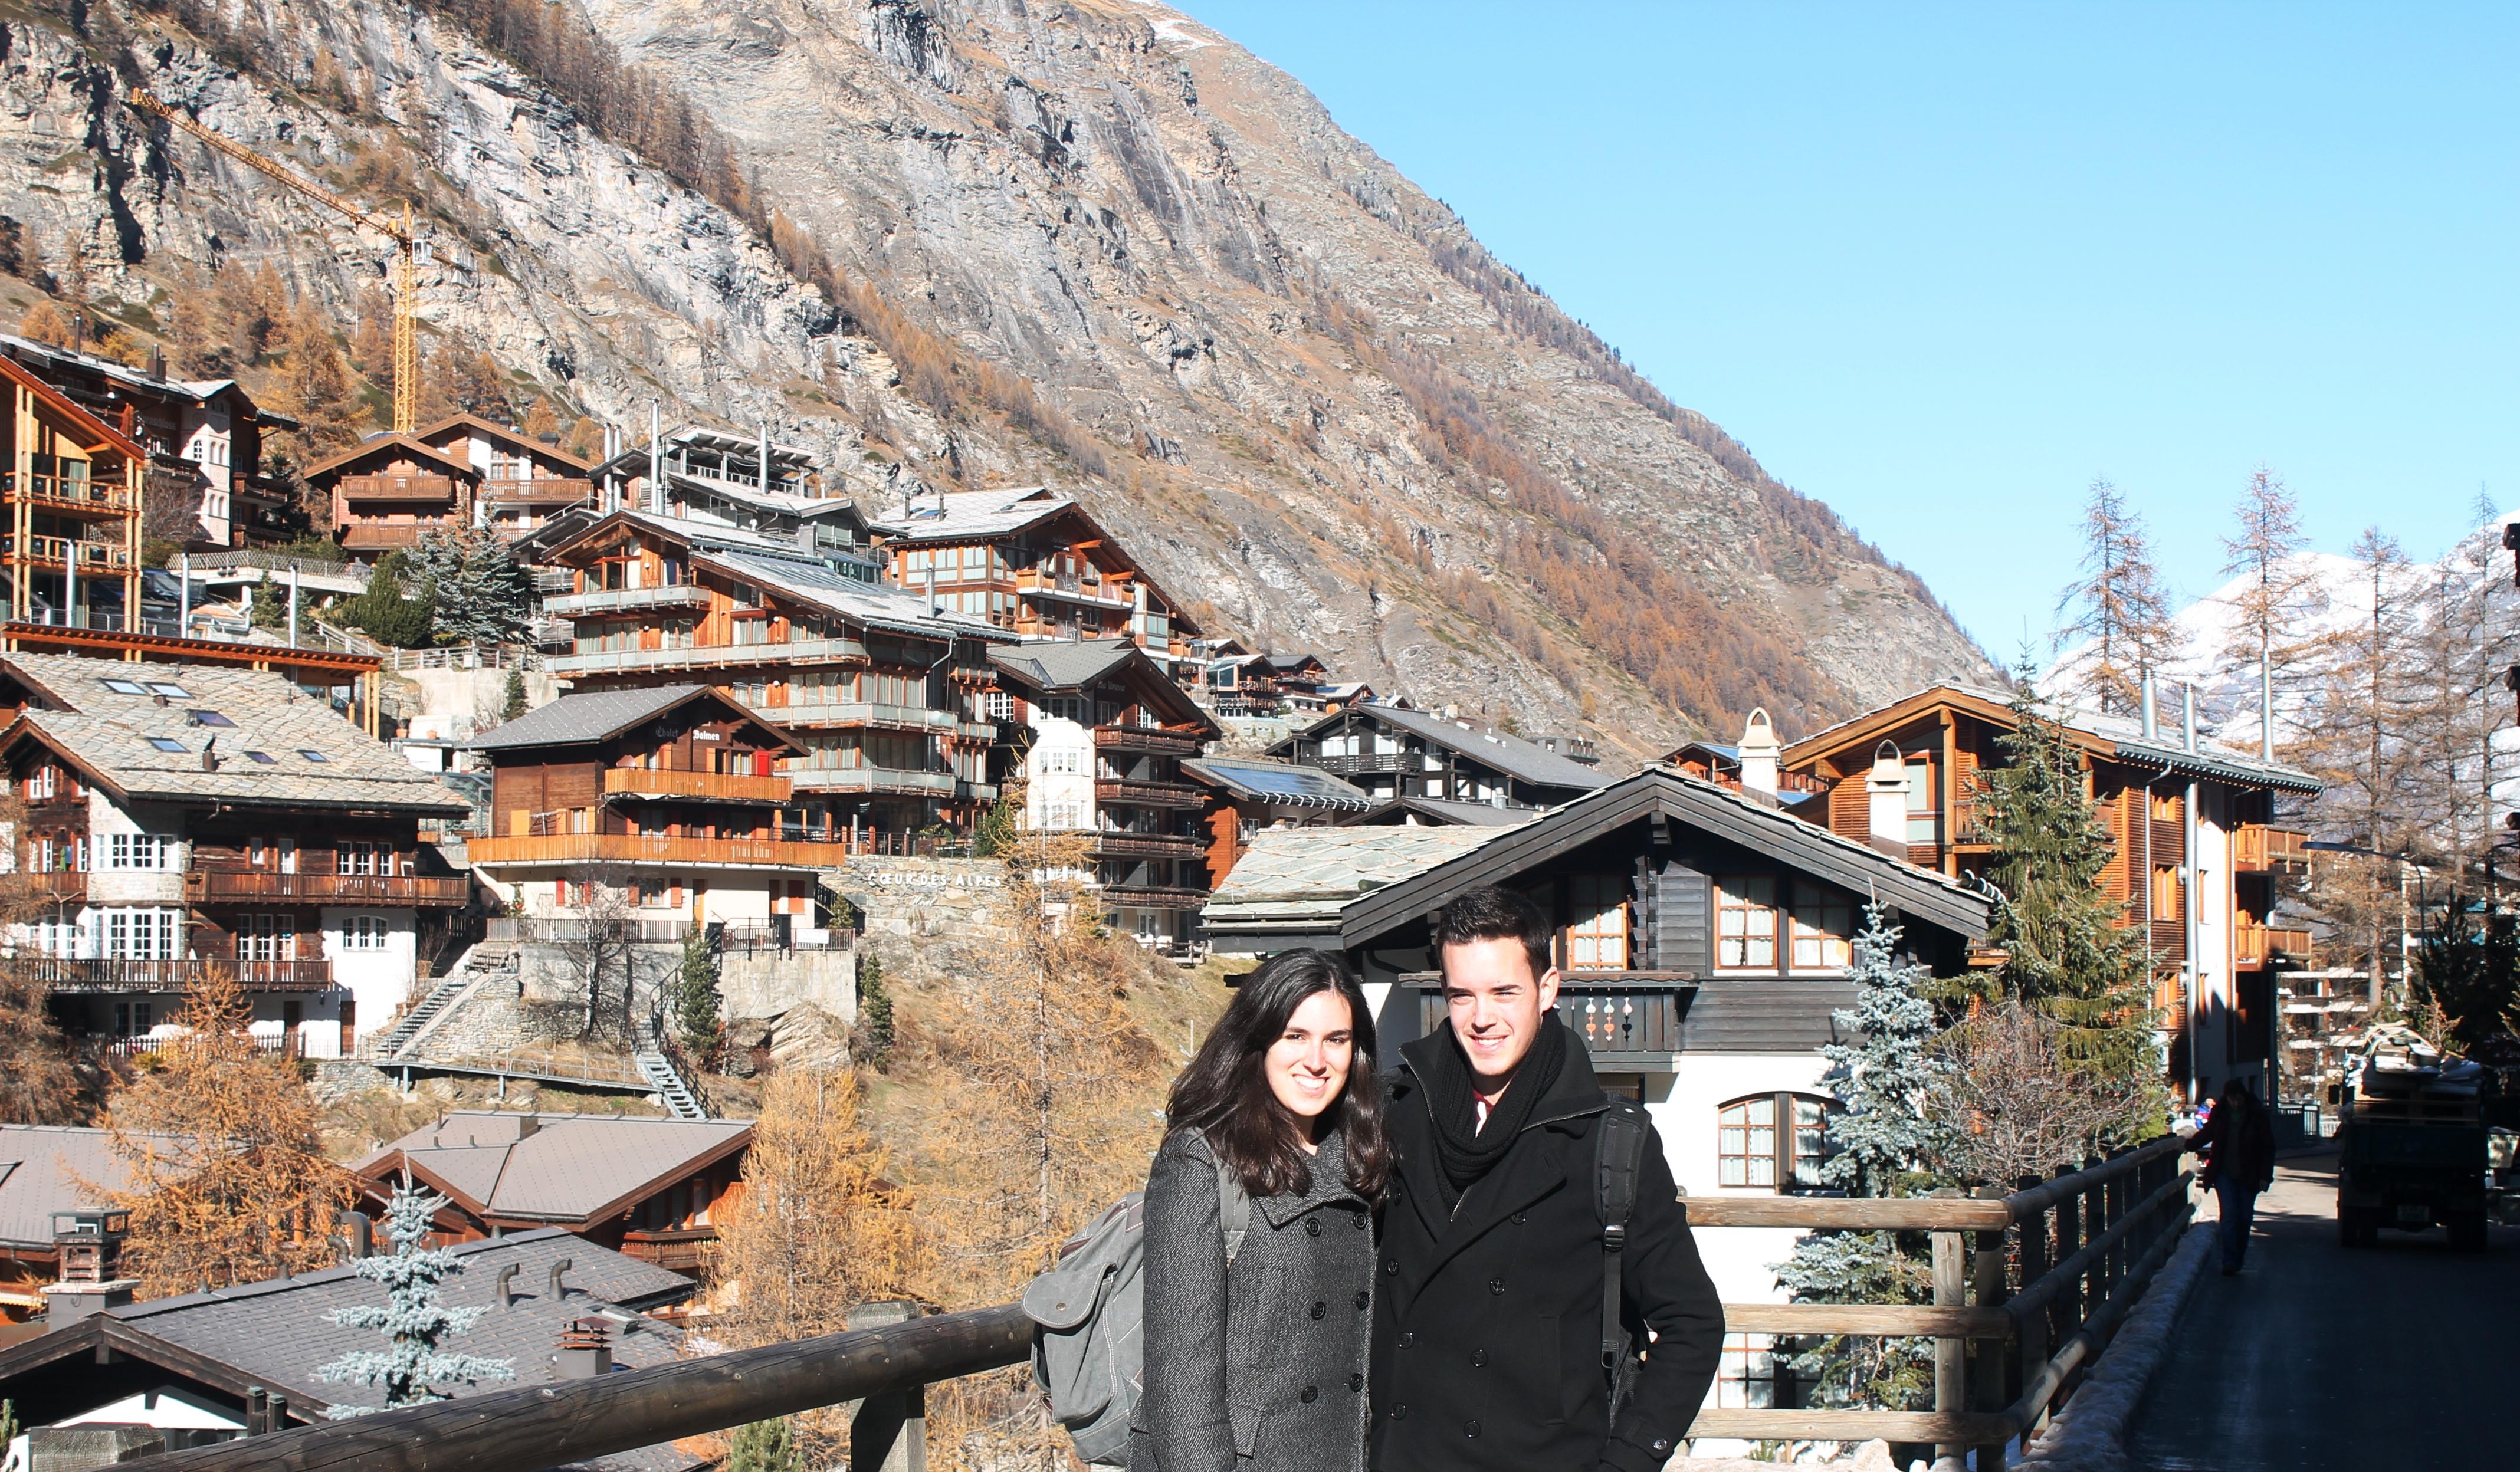 Caminando hacia el teleférico a Klein Matterhorn